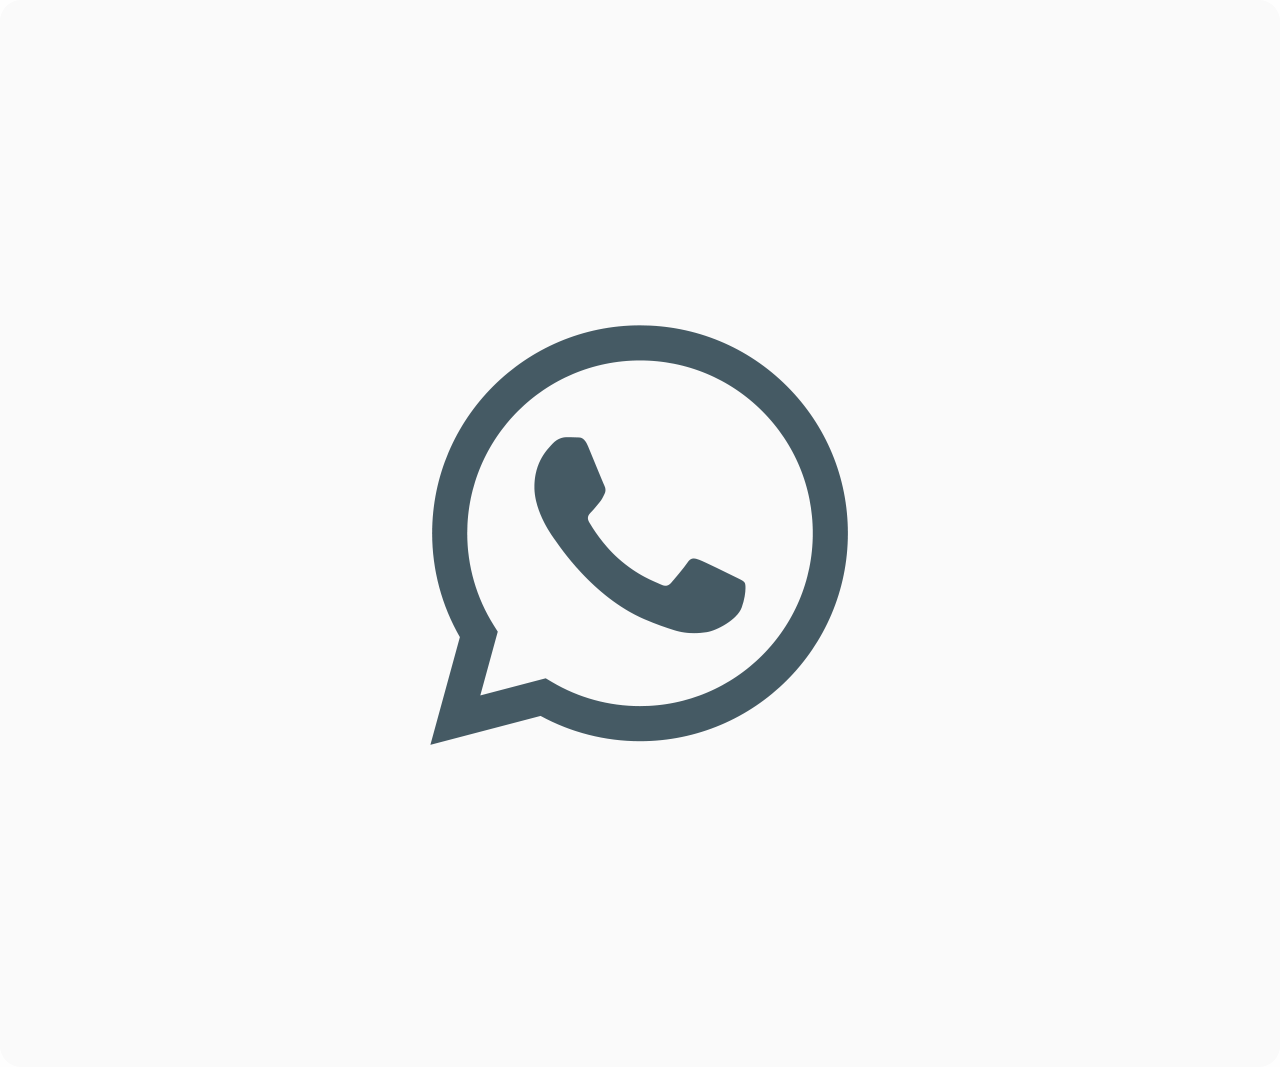 WhatsApp icon black and white